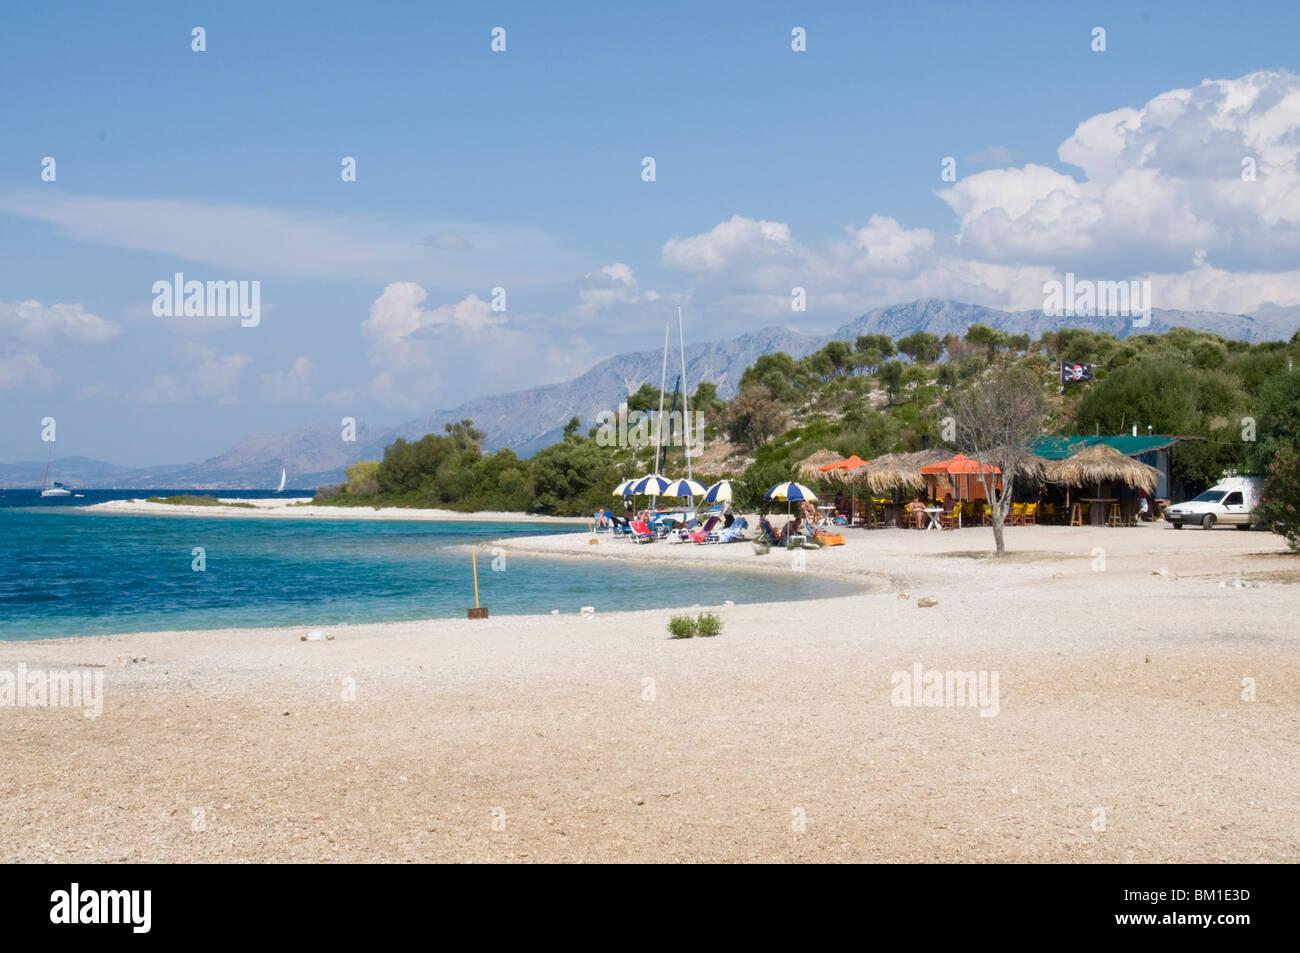 Meganisi, Ionian Islands, Greek Islands, Greece, Europe - Stock Image